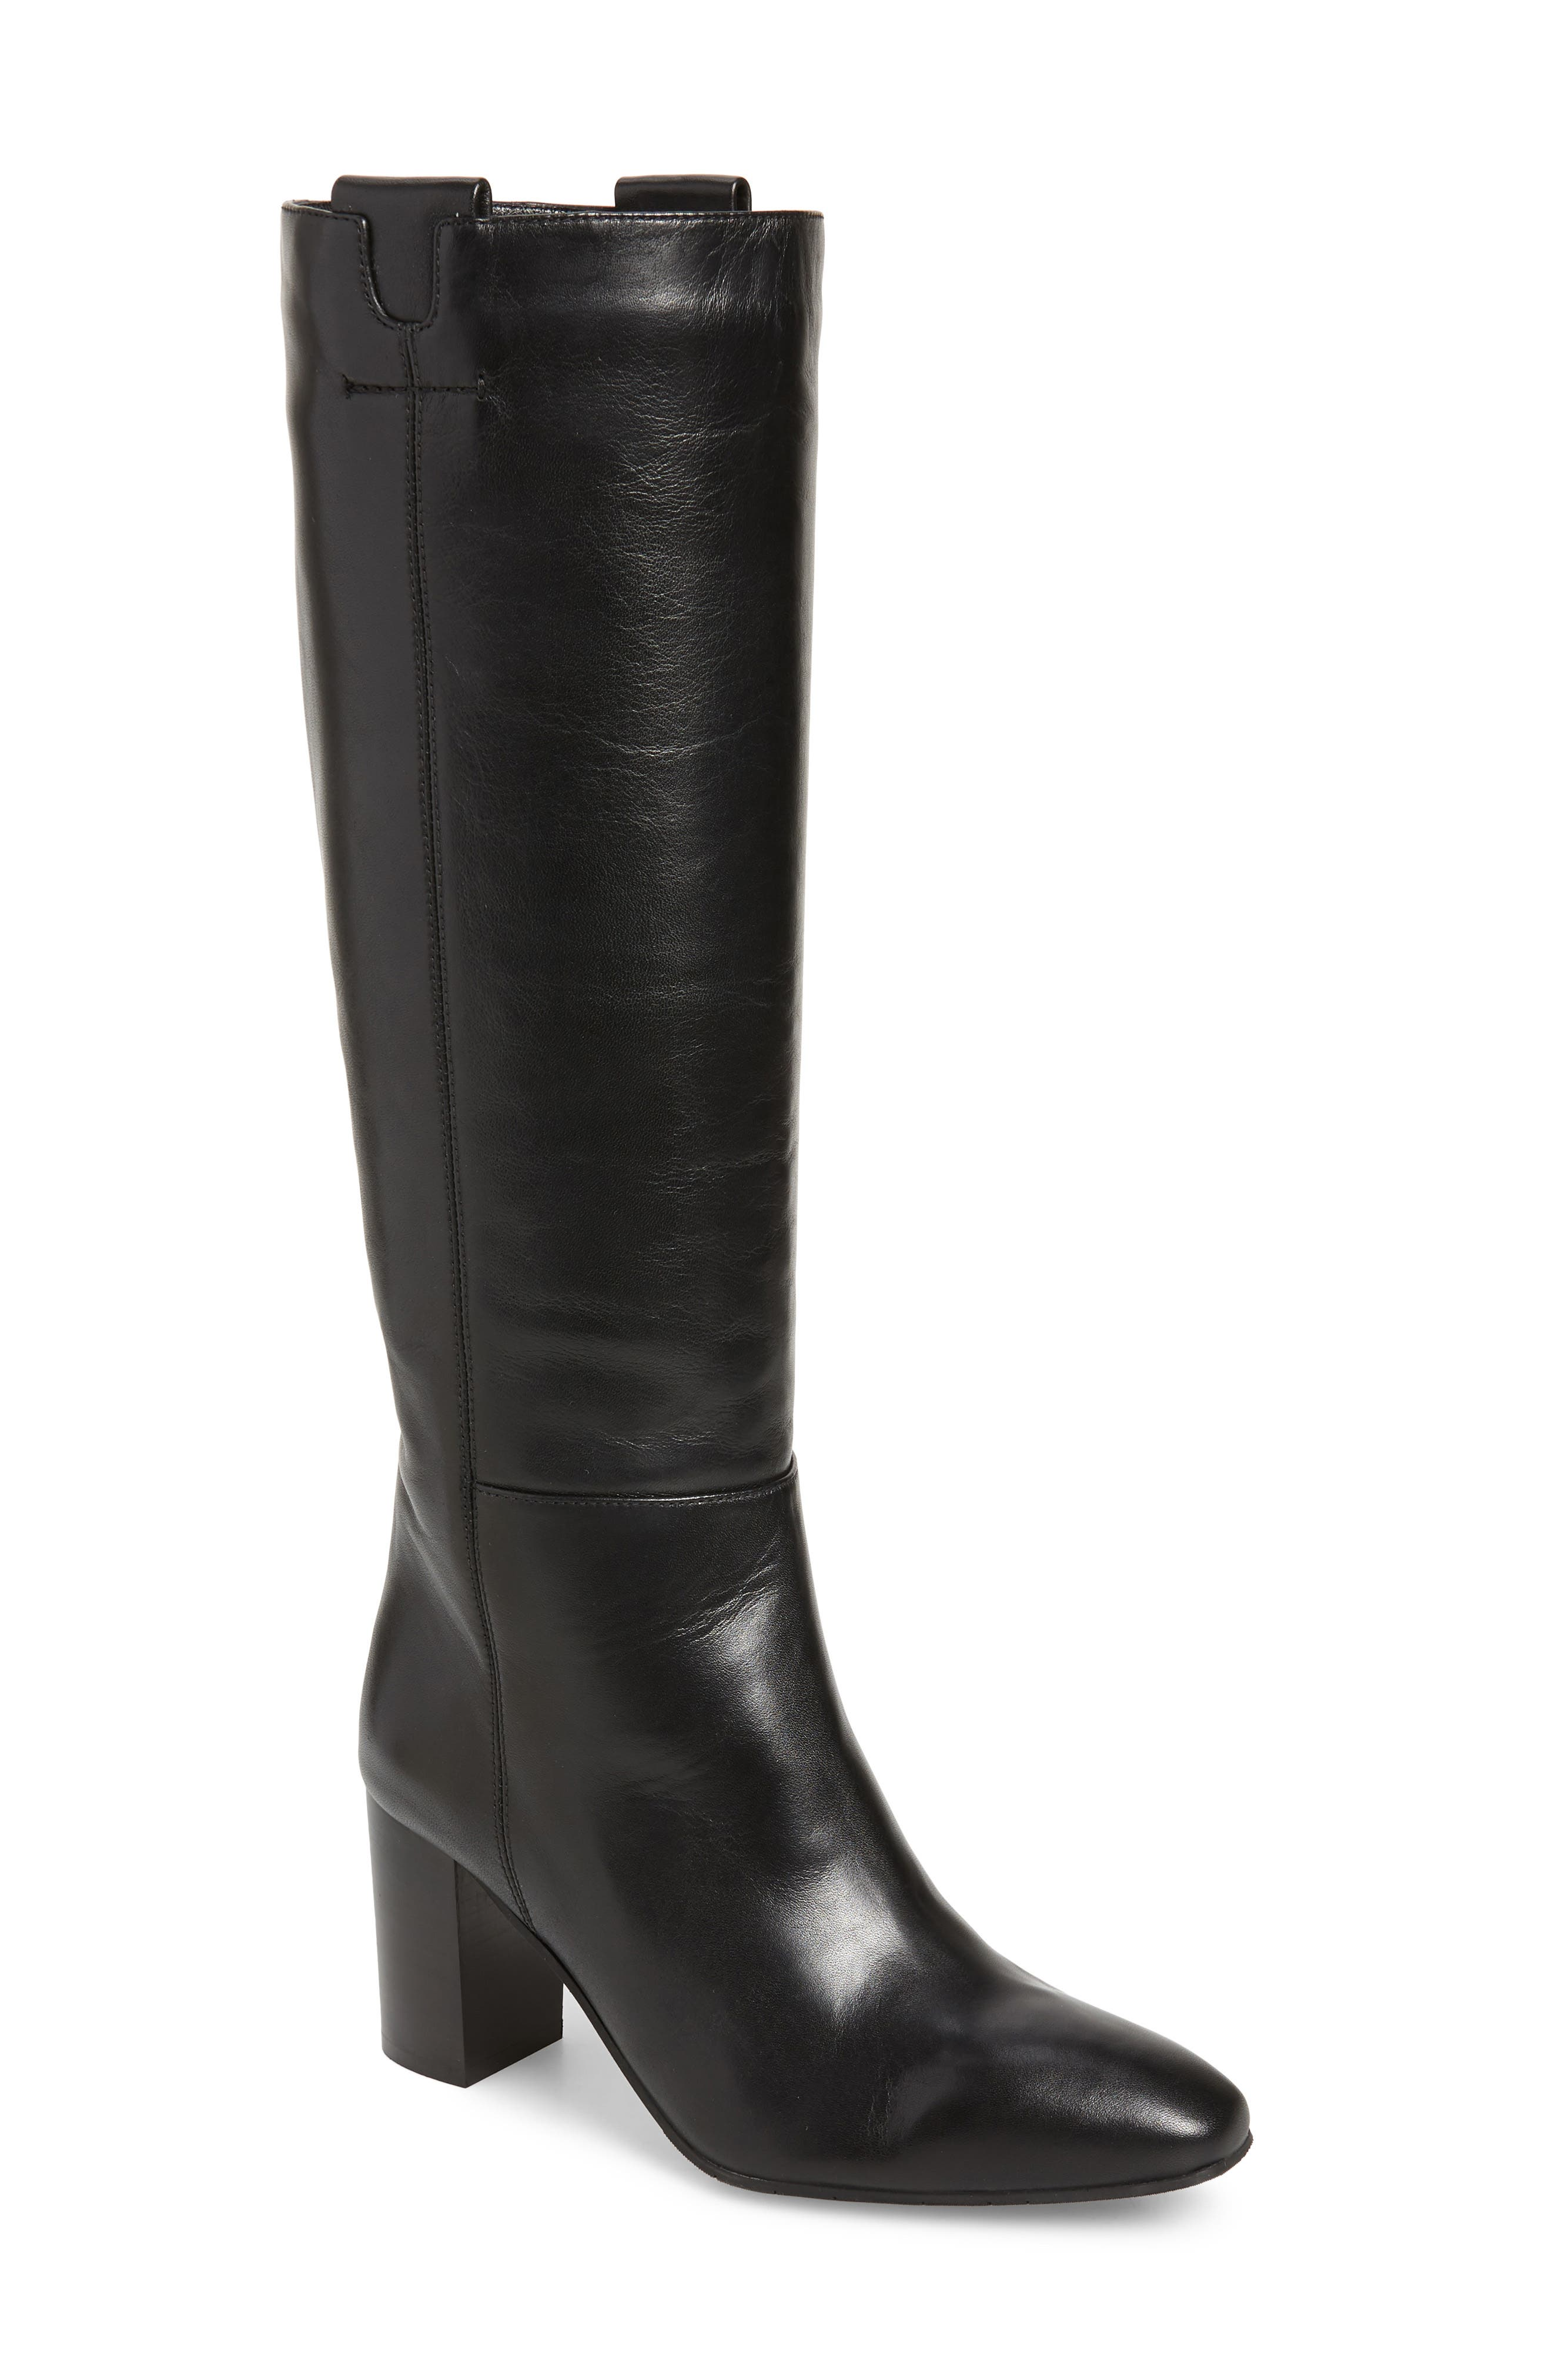 Image of Aquatalia Florianne Tall Weatherproof Leather Boot